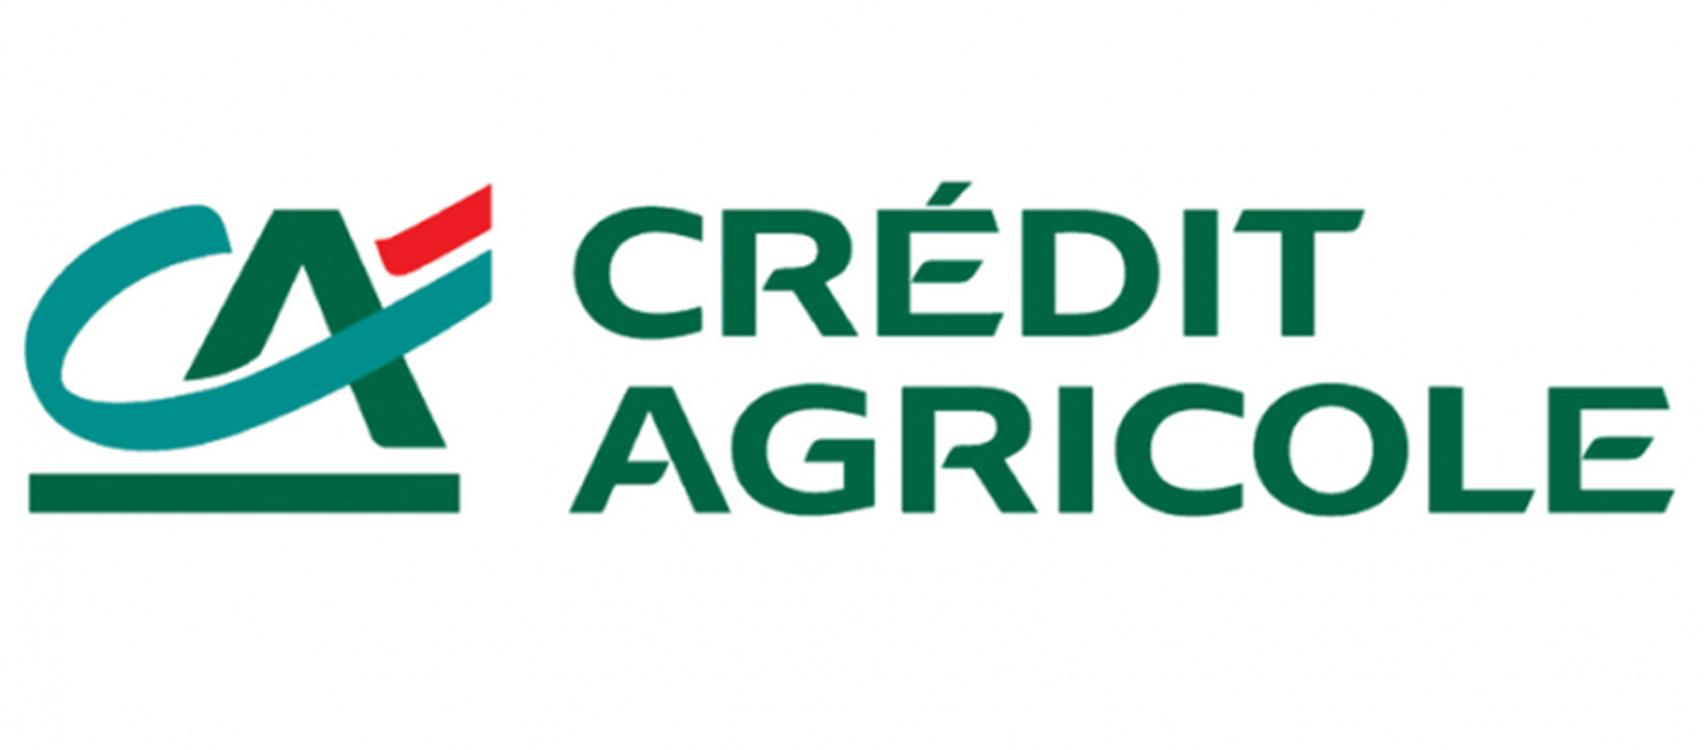 Credit Agricole  (погашение кредита)